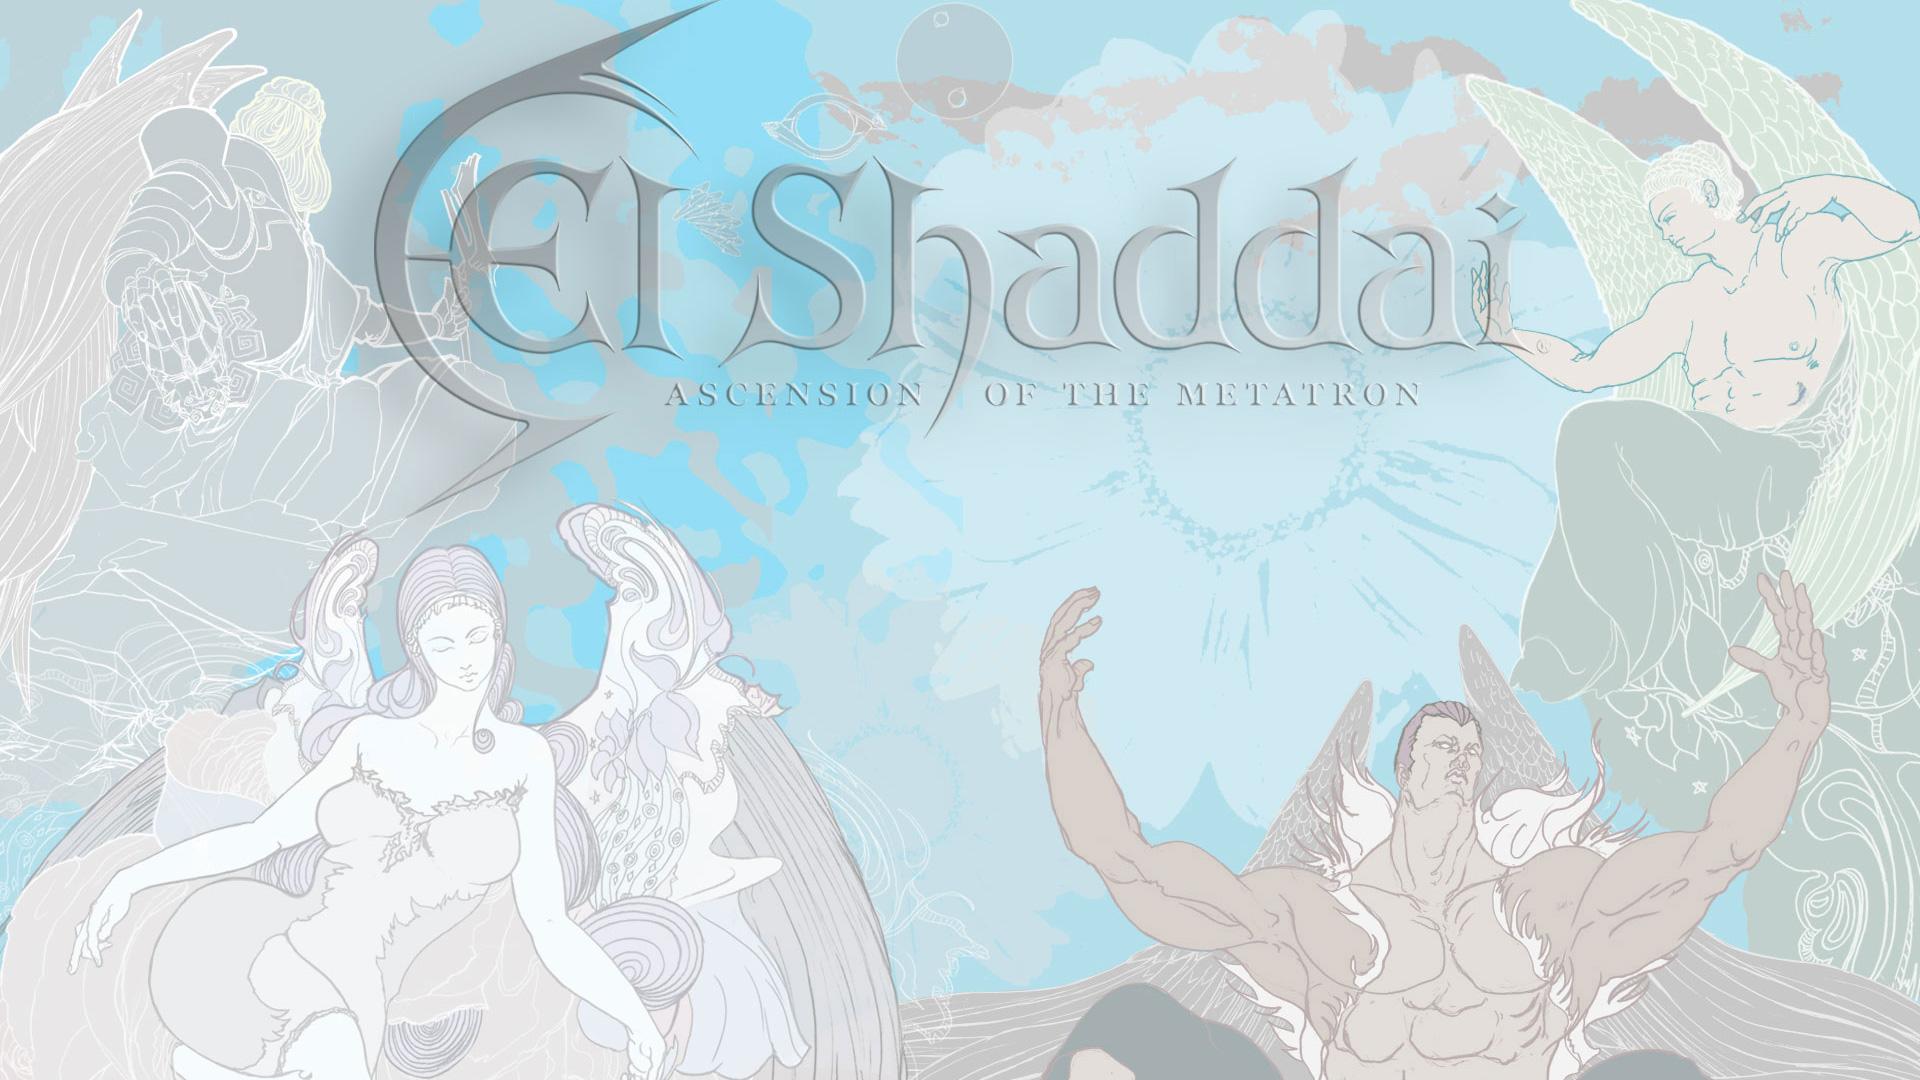 Free El Shaddai Wallpaper in 1920x1080